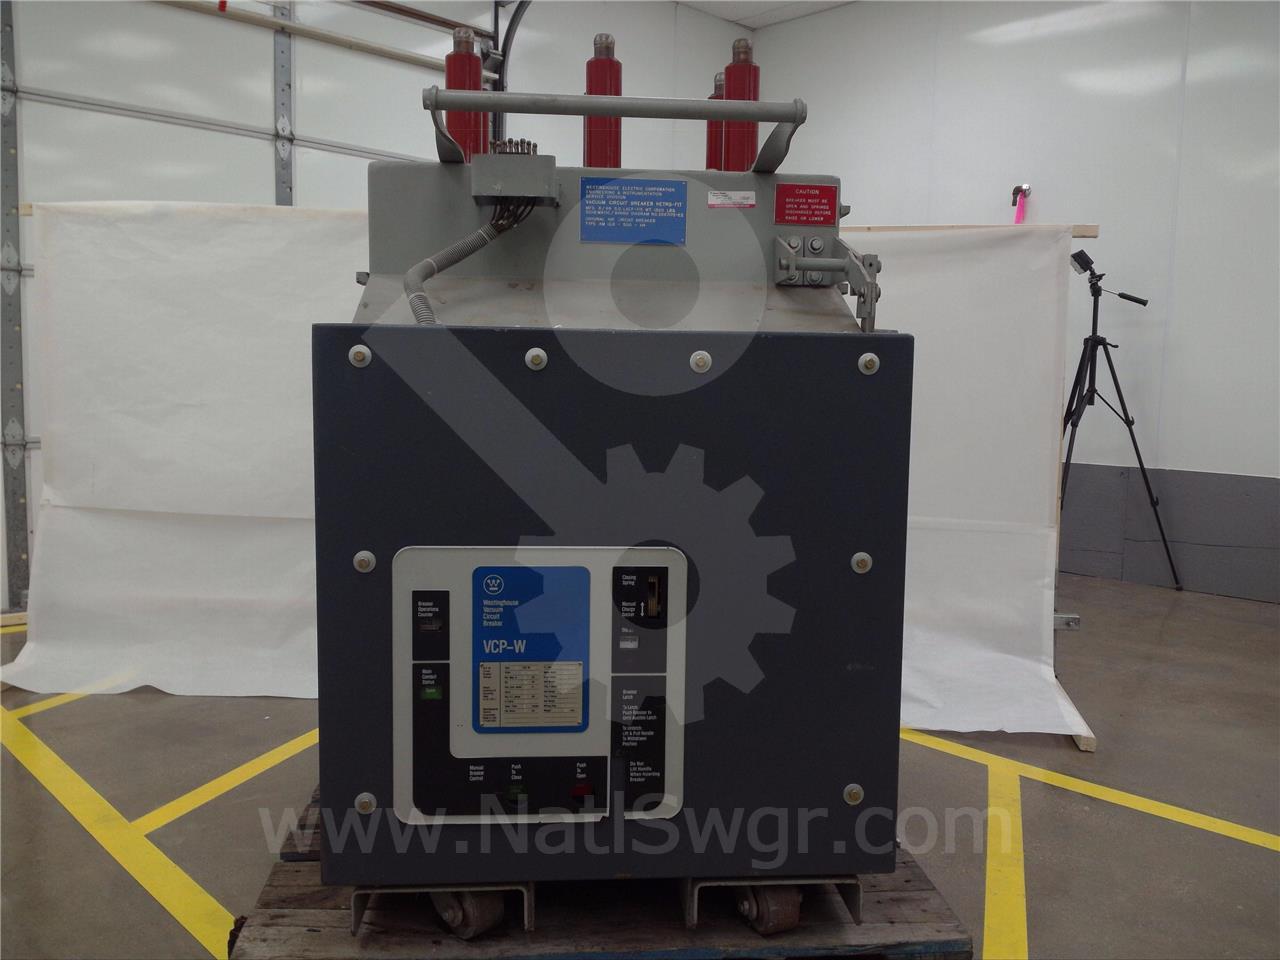 Westinghouse / Cutler Hammer 1200A WH AM/150 VCP-W 500 RIR (150VCP-W 500)